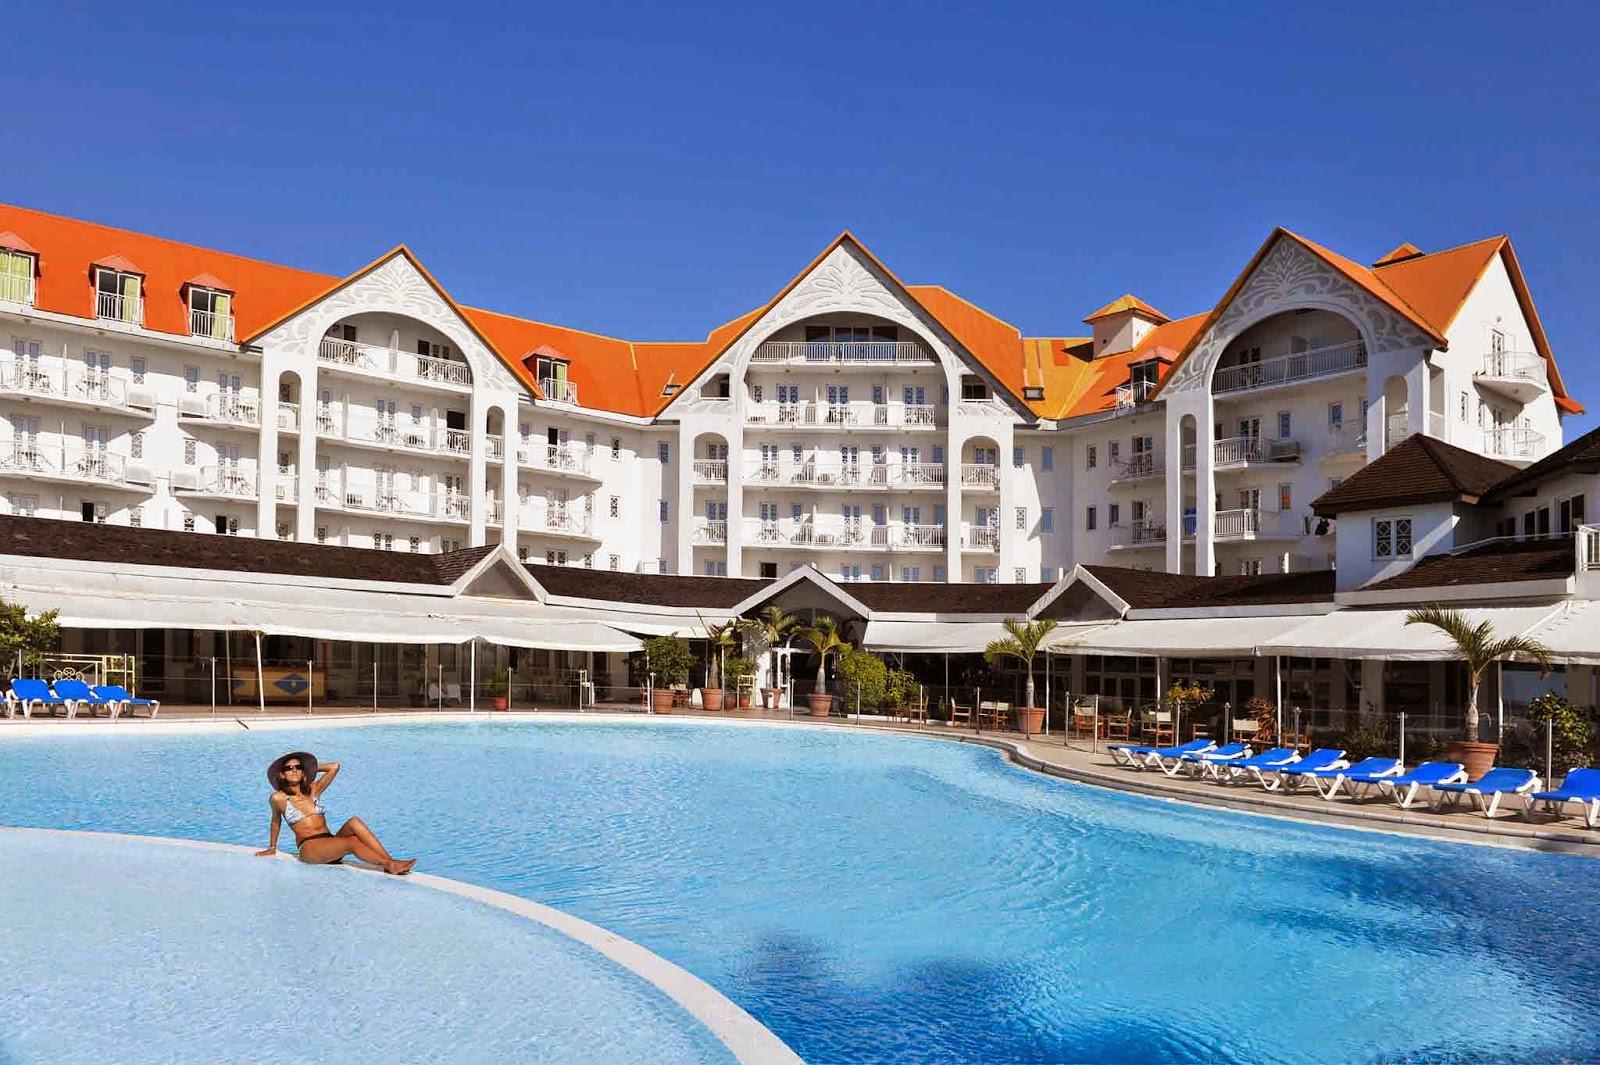 Mercure creolia saint denis la reunion 100 euros hotel 4 for Hotels saintes